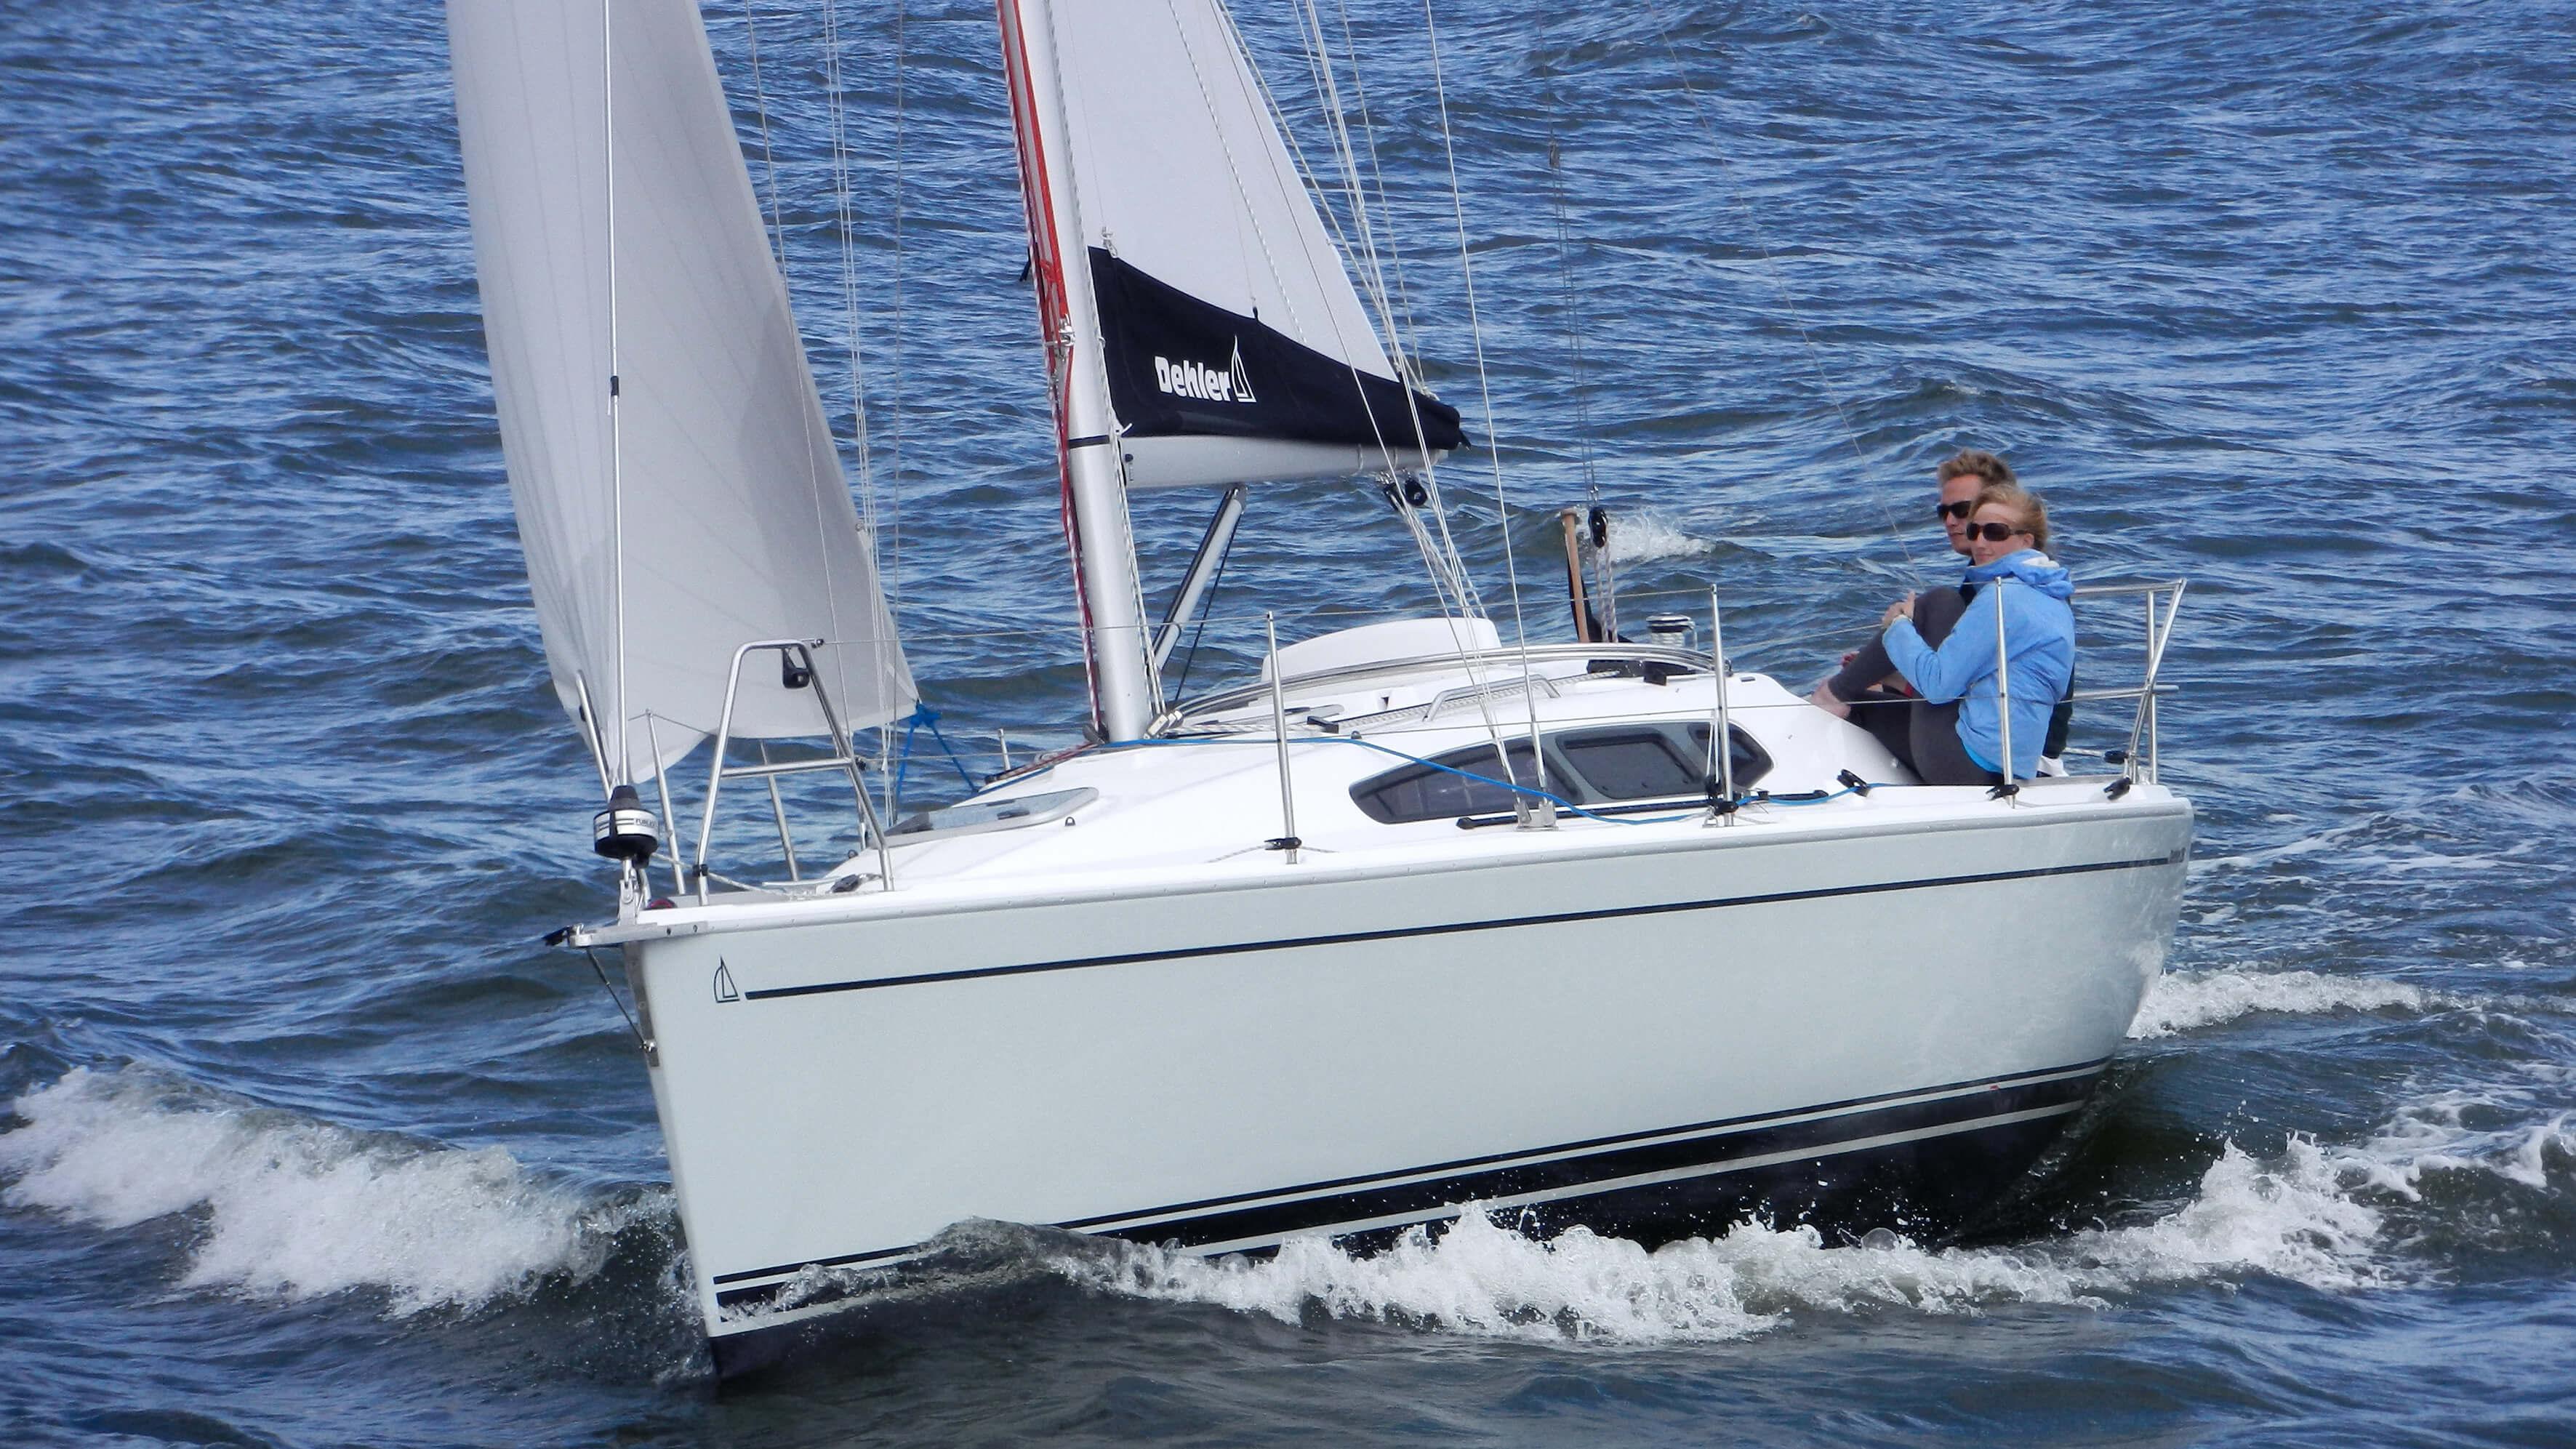 Exterior Sailing | mainsail, foresail | Dehler